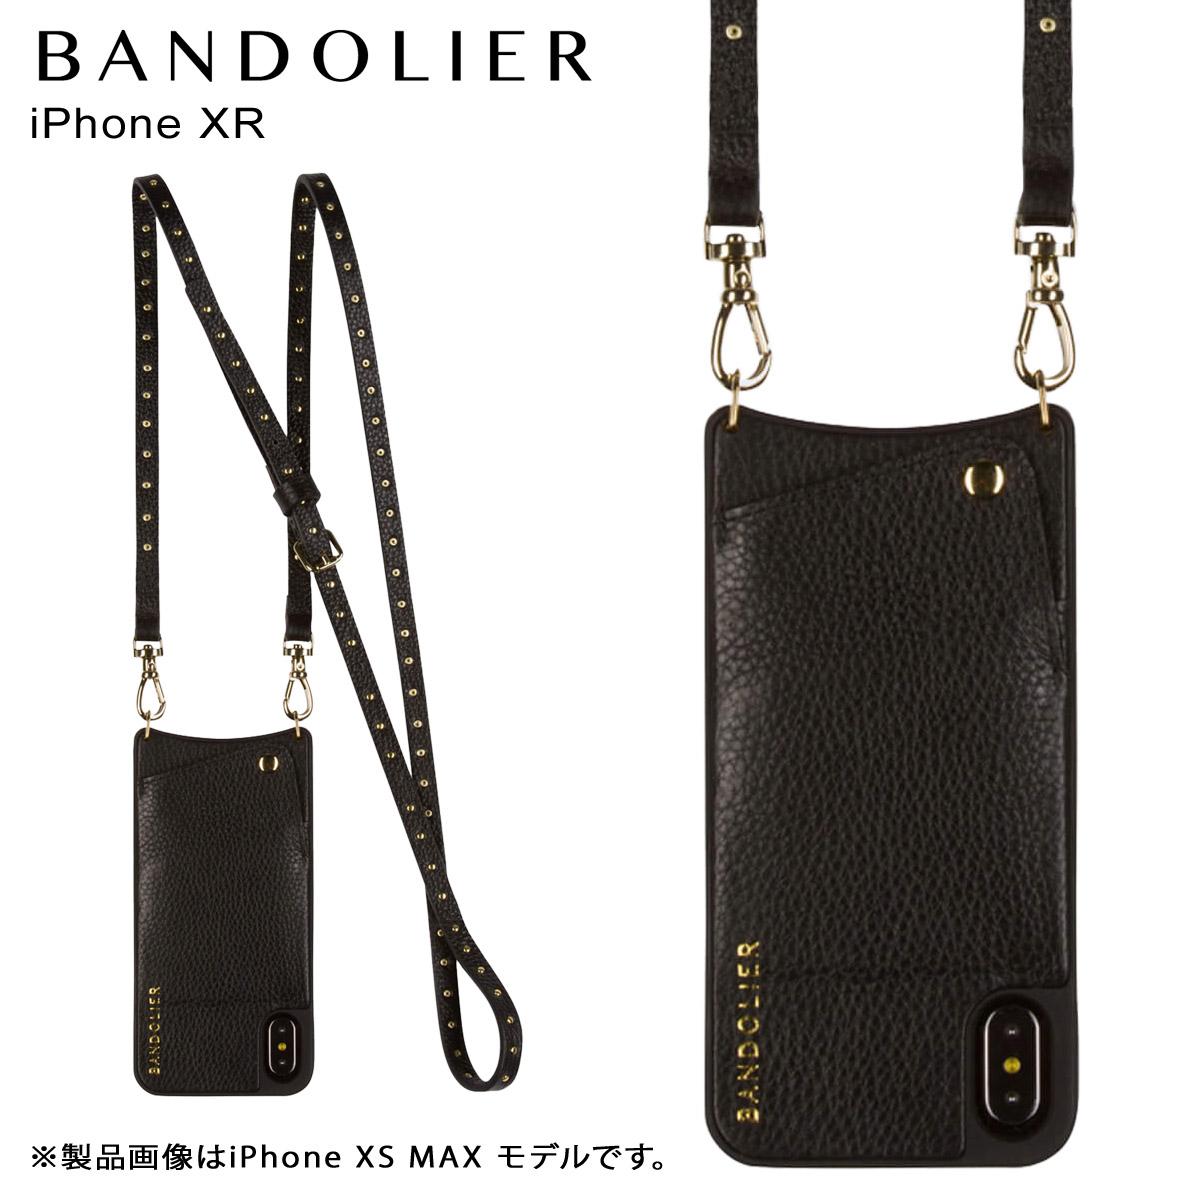 BANDOLIER iPhone XR NICOLE GOLD バンドリヤー ケース ショルダー スマホ アイフォン レザー メンズ レディース ブラック 10NIC1001 [予約商品 4月下旬頃入荷予定 再入荷]